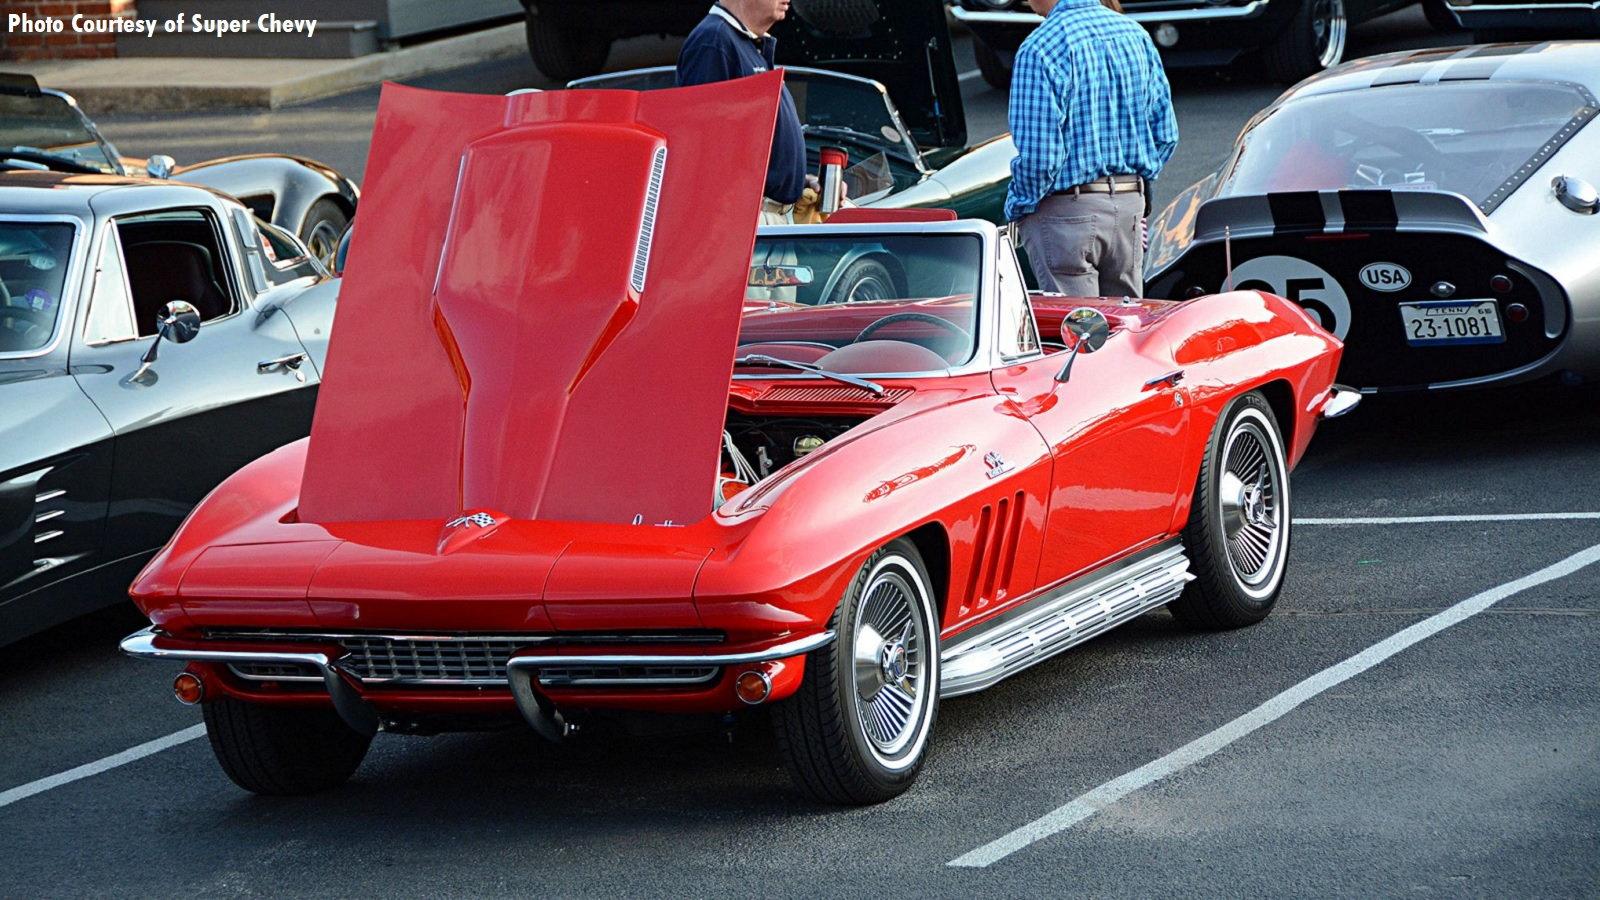 Corvettes At Coker Tire CruiseIn Corvetteforum - Coker tire car show